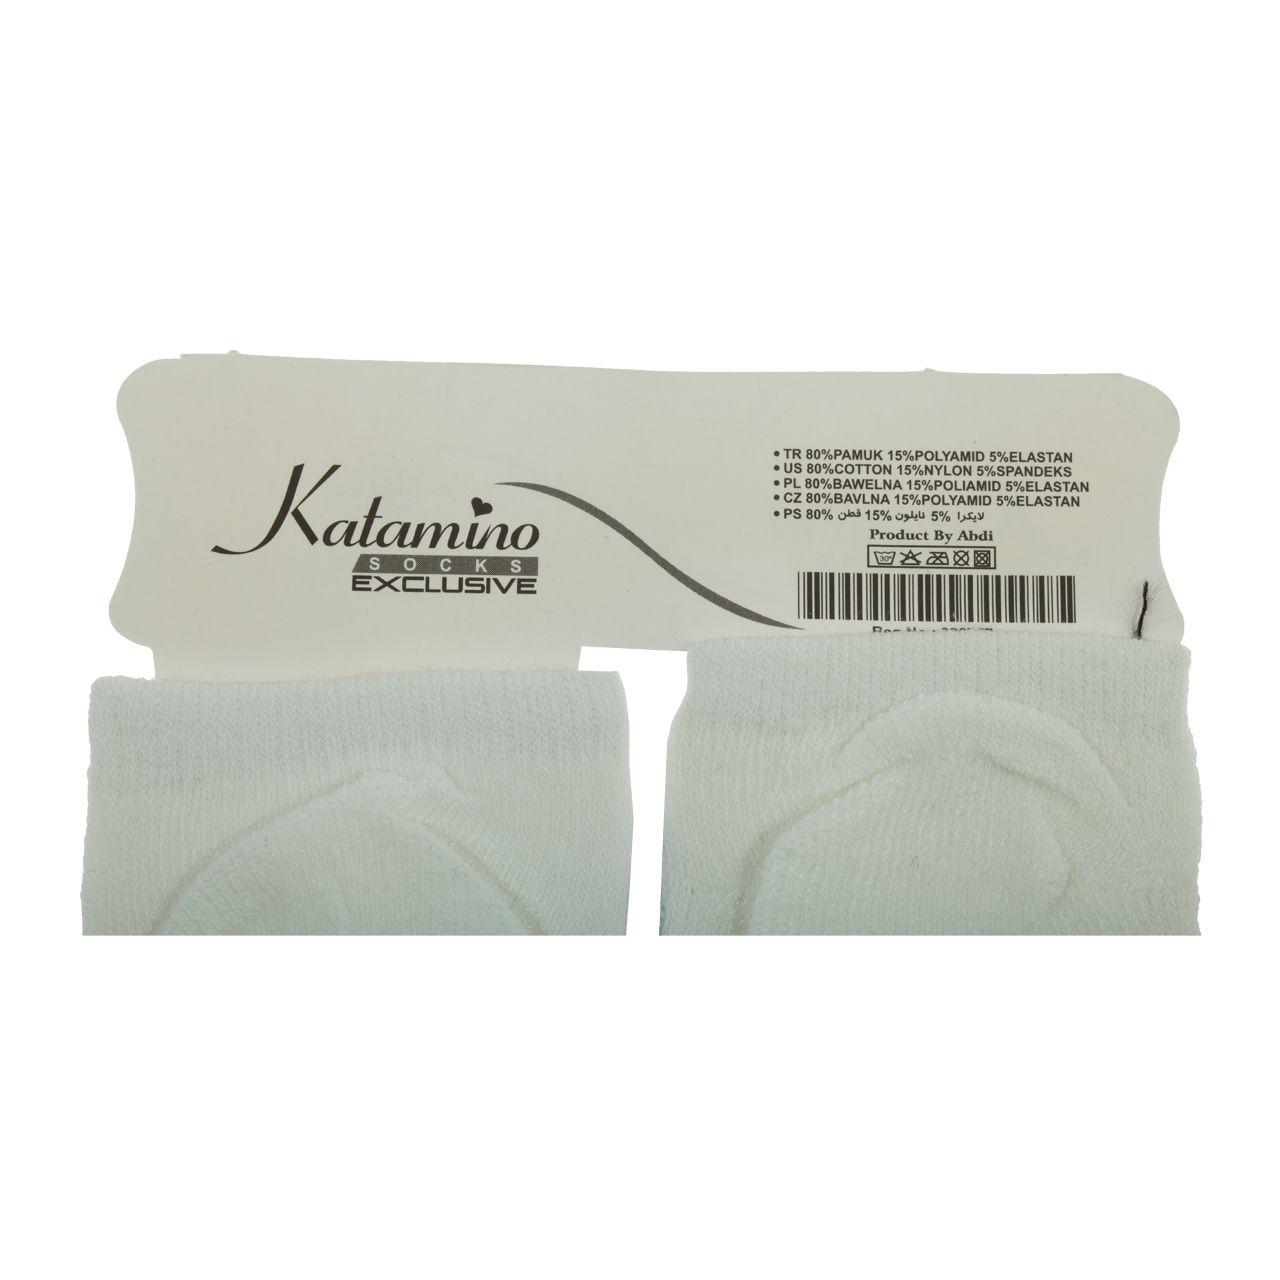 جوراب نوزاد کاتامینو طرح پاندا سرخپوست -  - 2